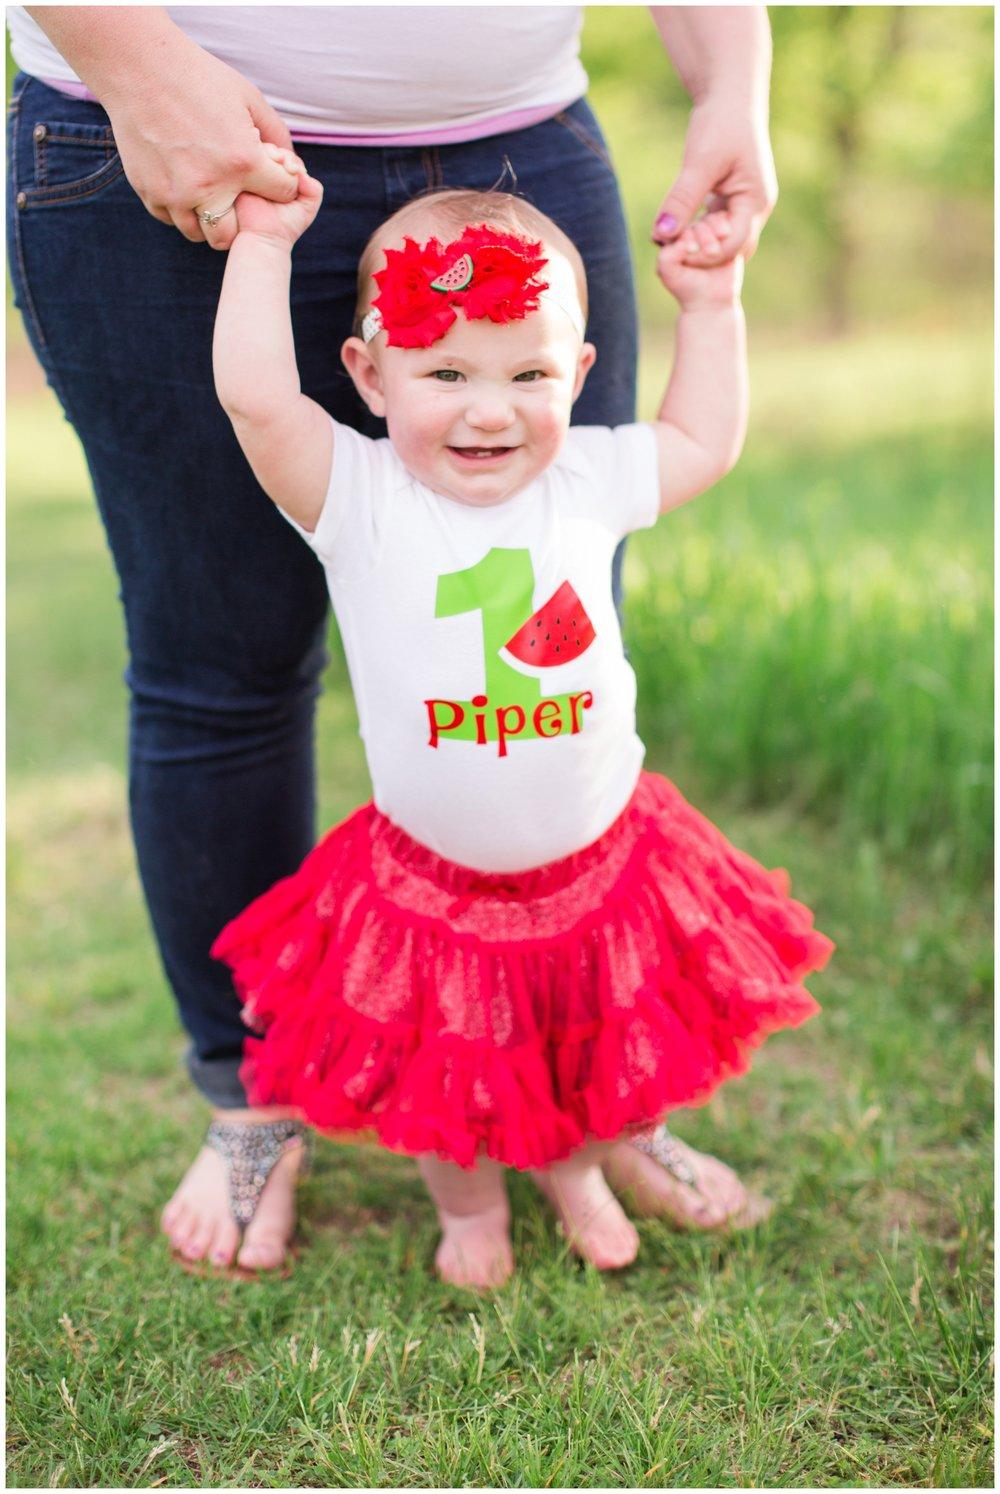 Piper-1-8964.jpg